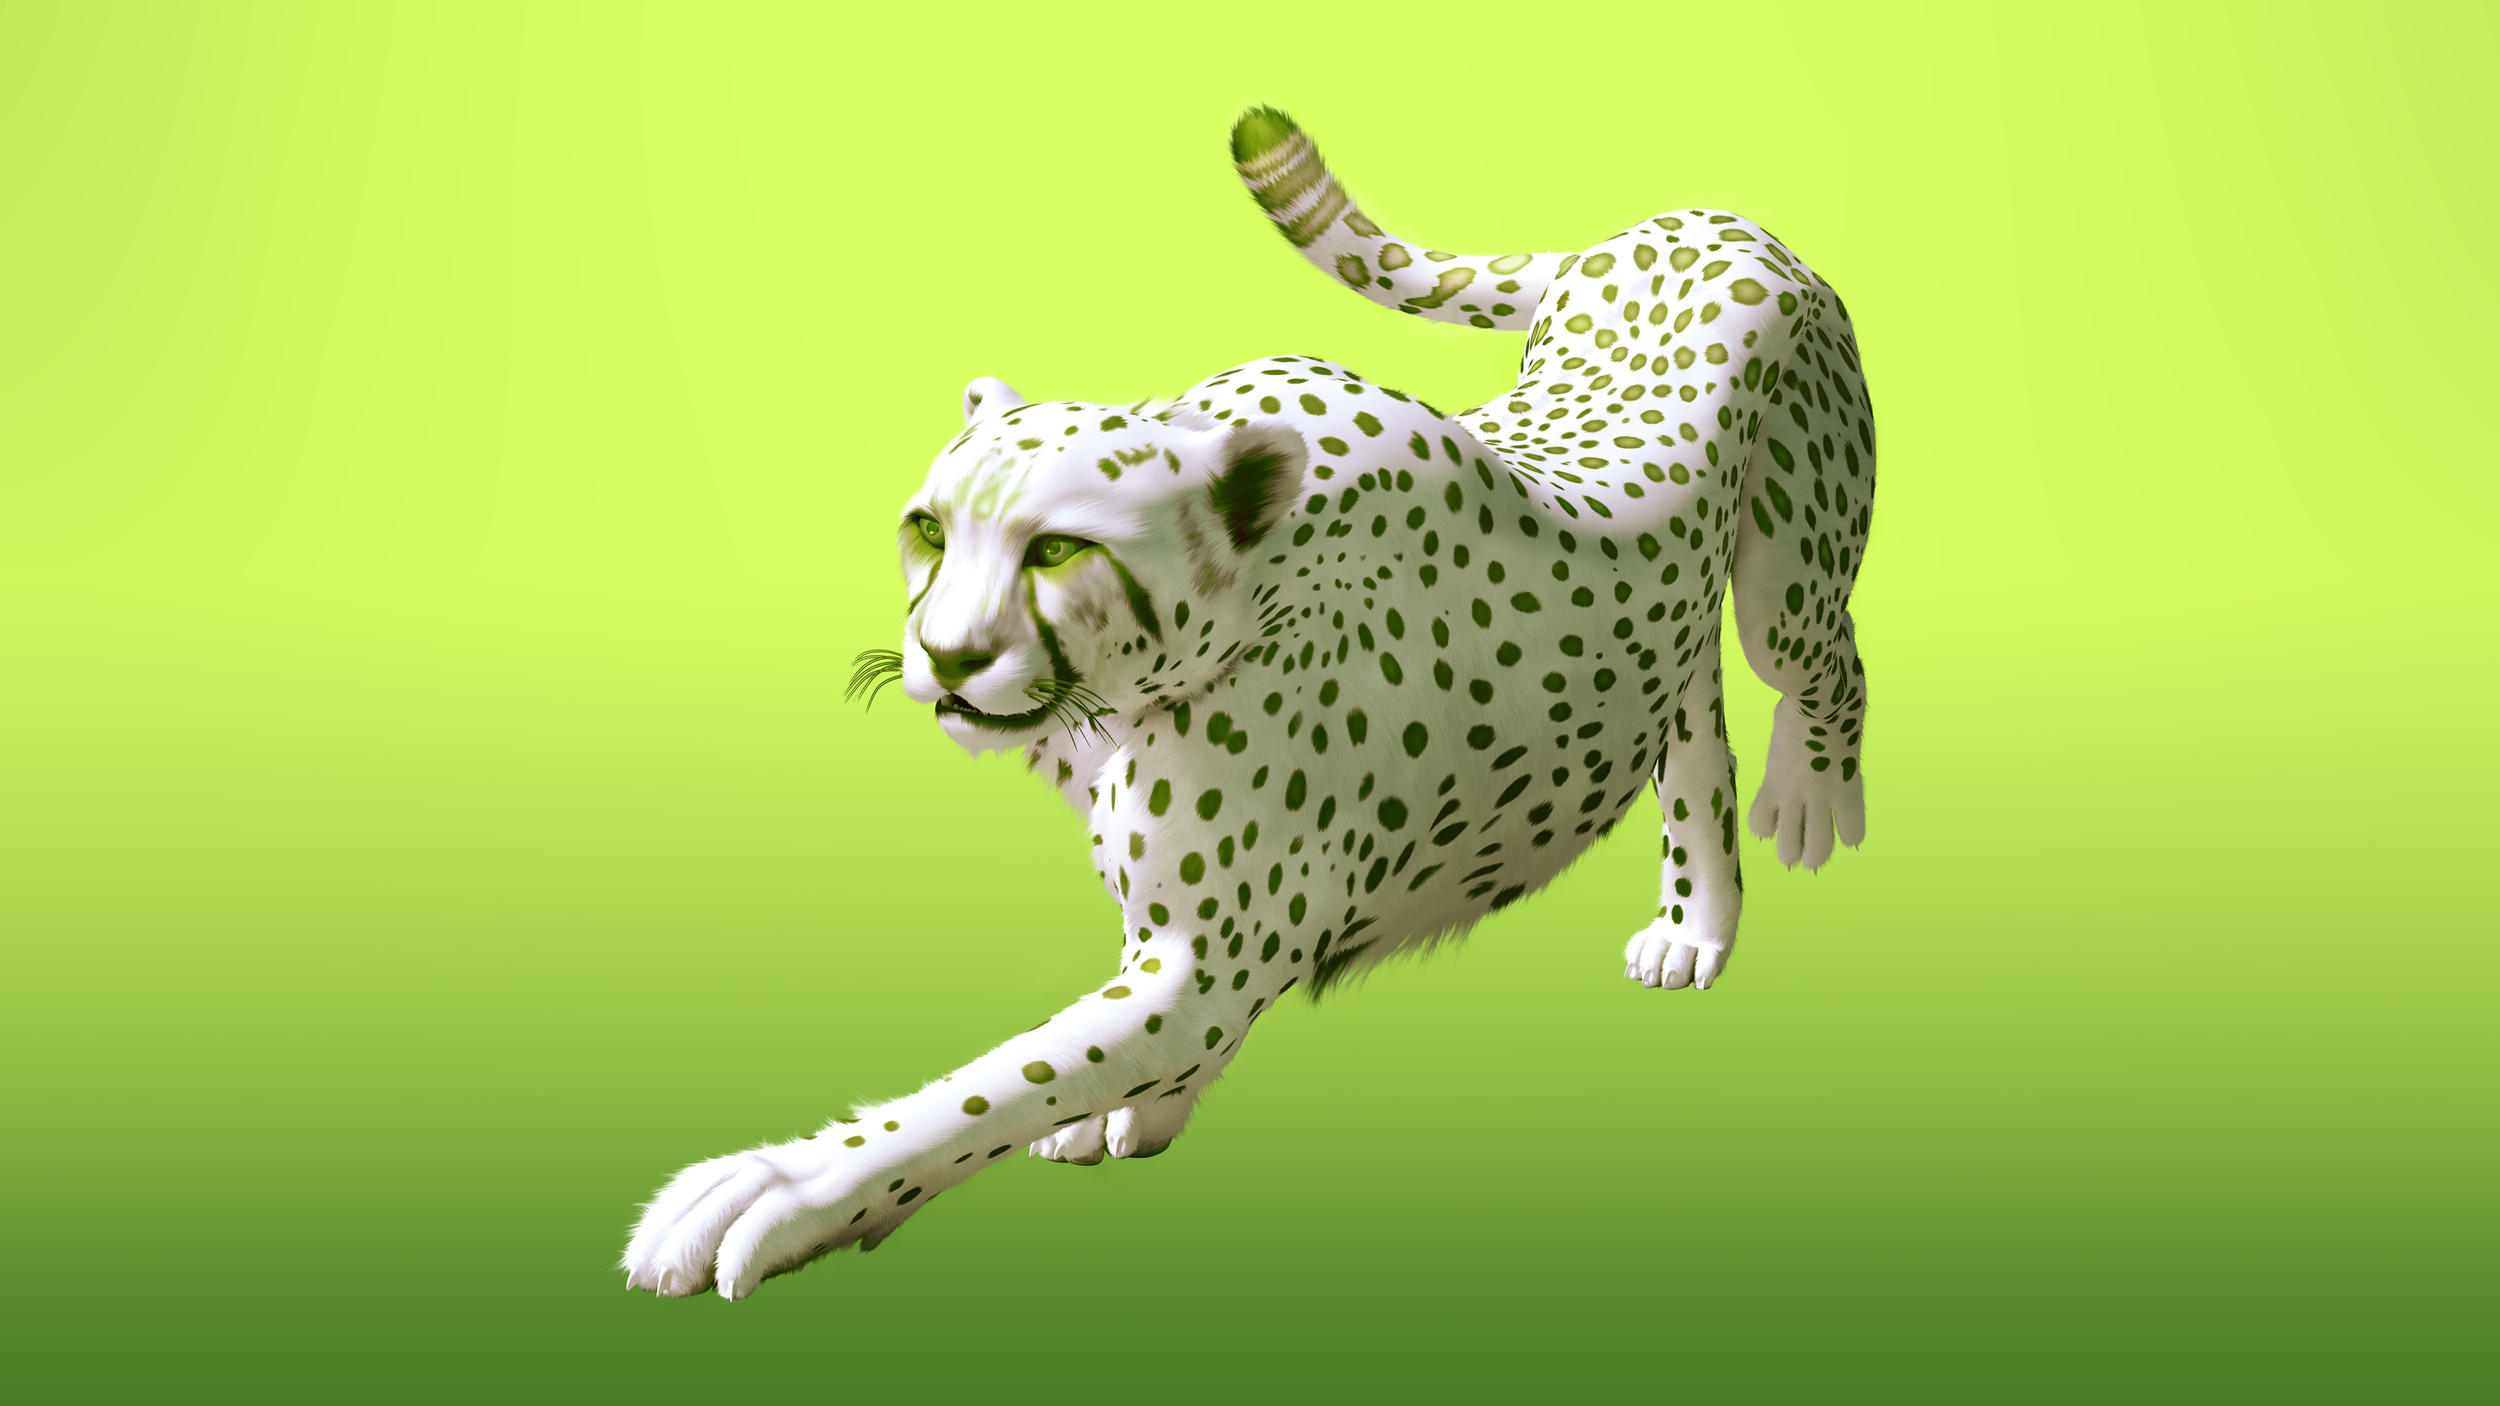 Cheetah2_v04_small.jpg